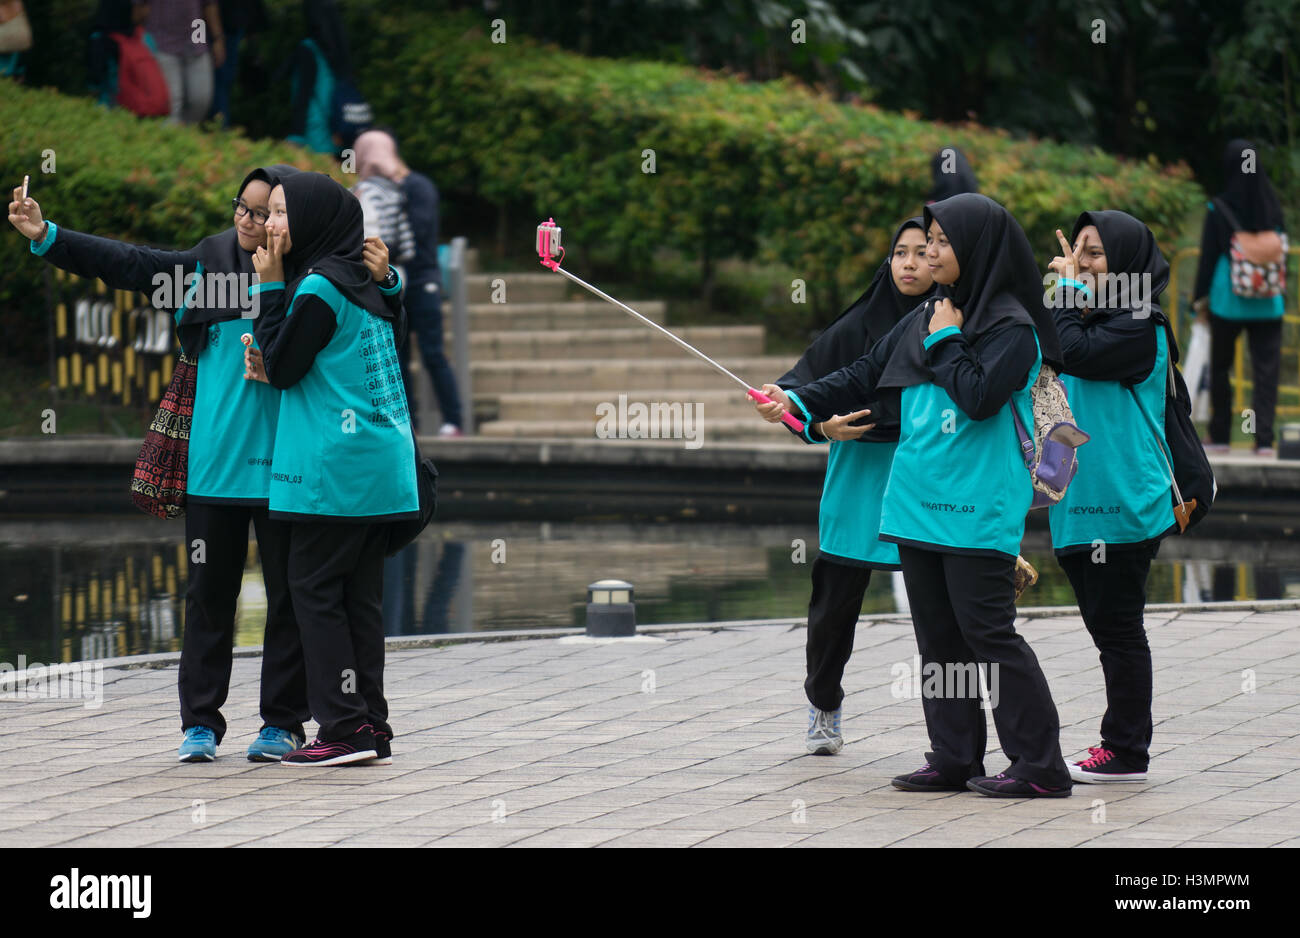 A group of Muslim girls wearing Hijabs taking Selfies on a mobile phone near to the Petronas Twin Towers,Kuala Lumpur,Malaysia - Stock Image